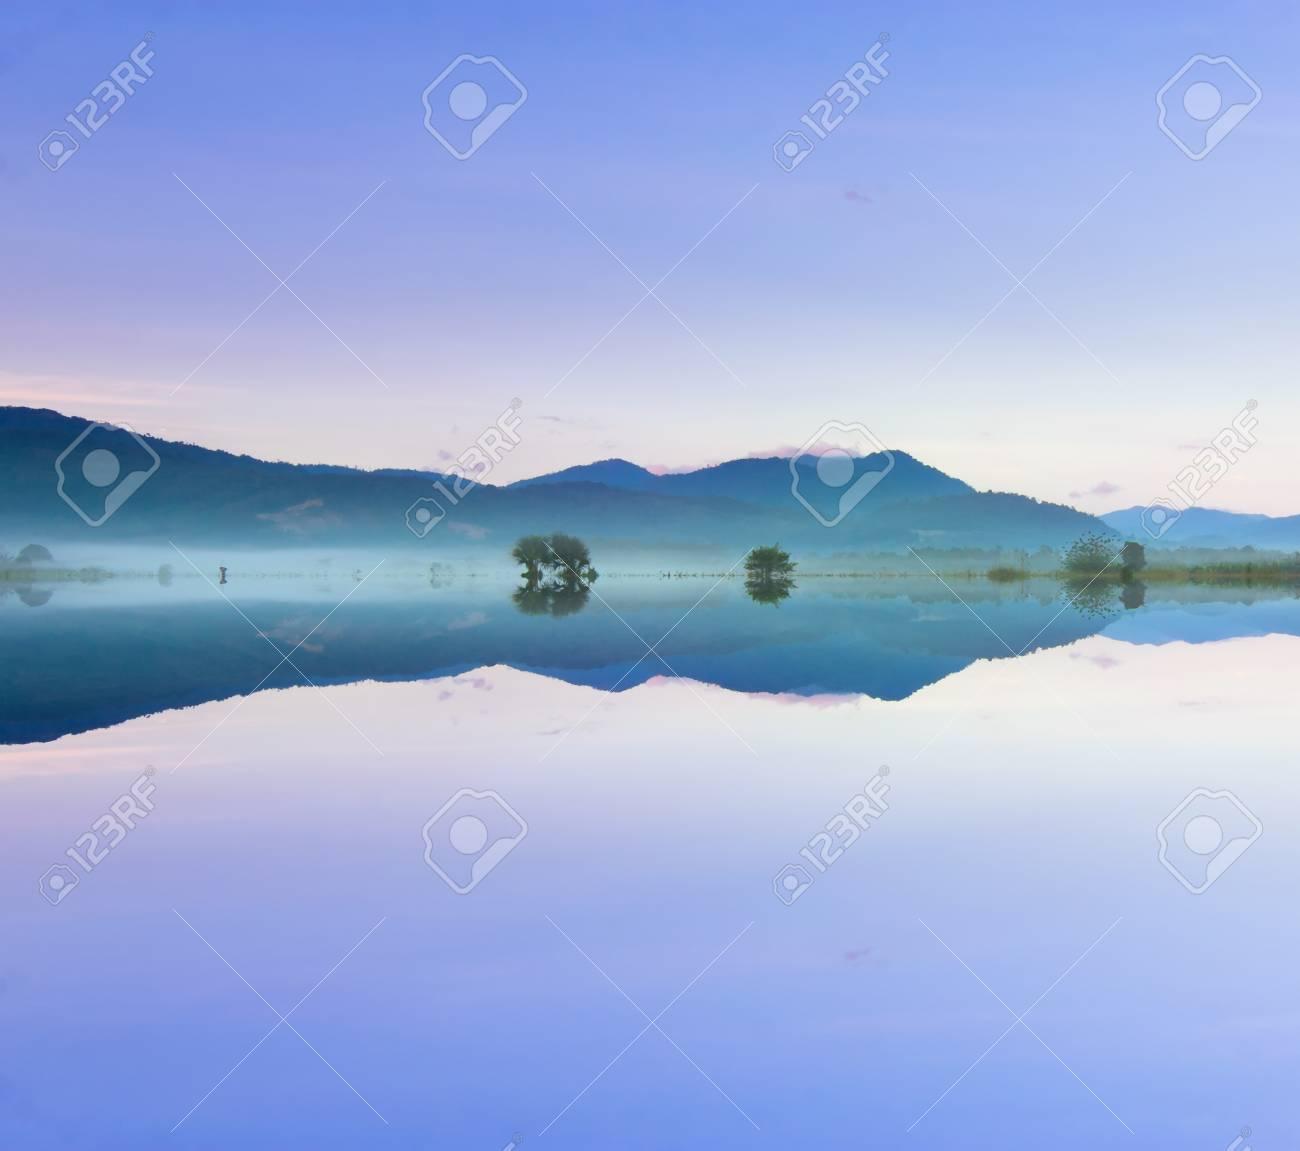 Reflection of hills at Borneo, Sabah, Malaysia - 25803046